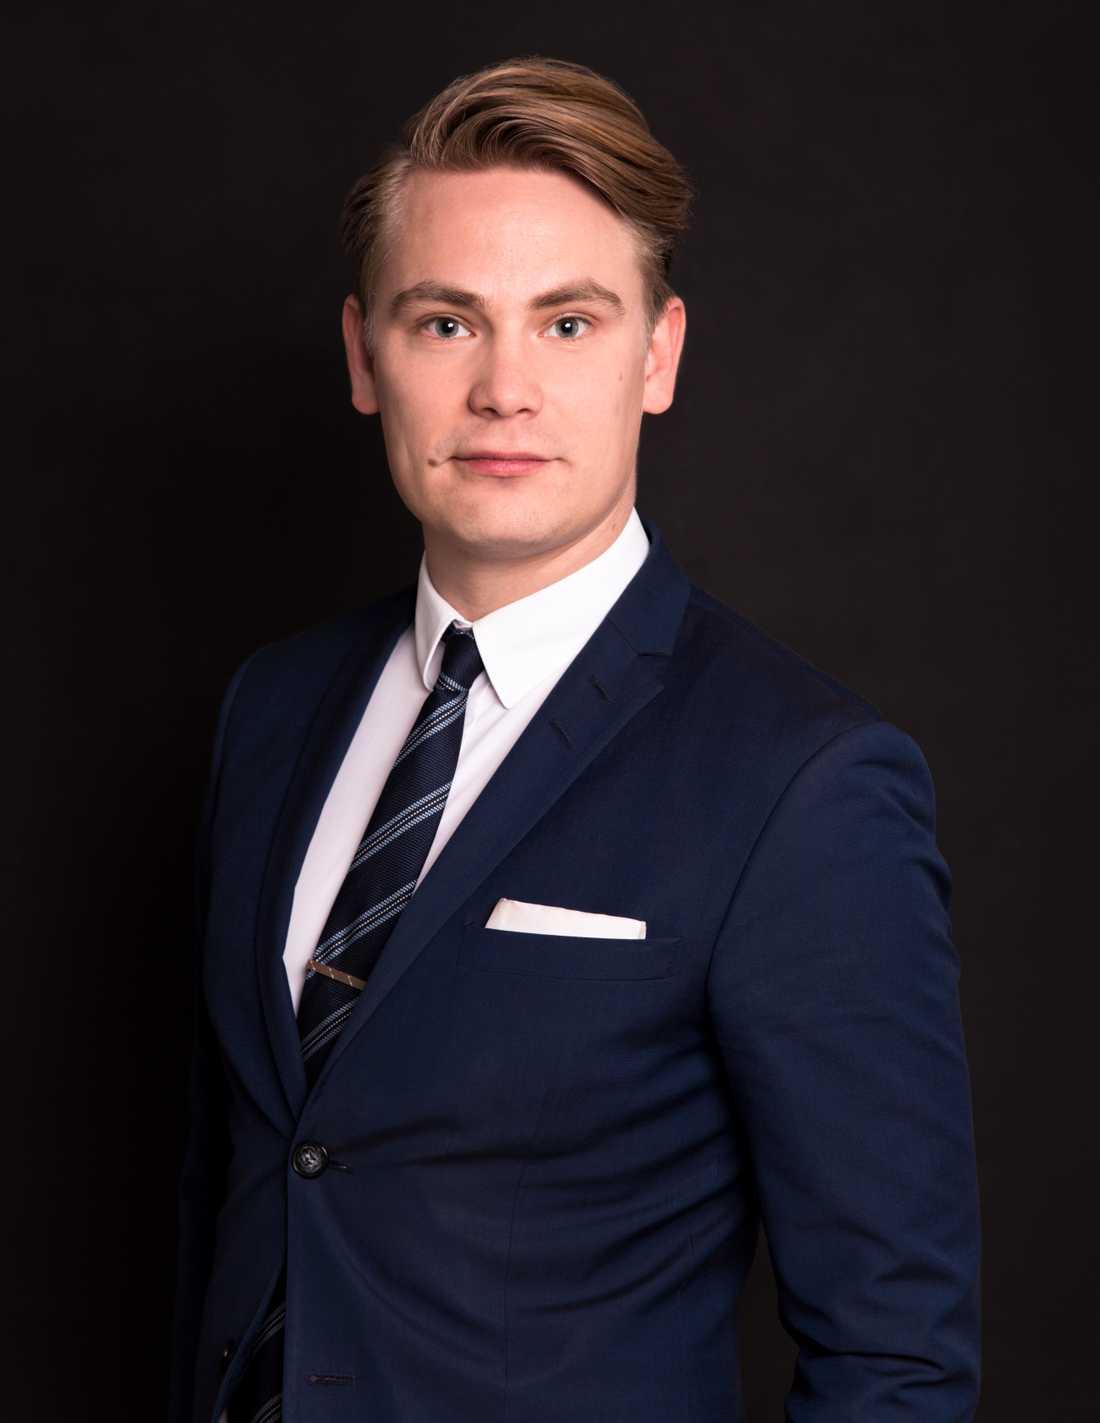 Biträdande jurist Harri Keränen.